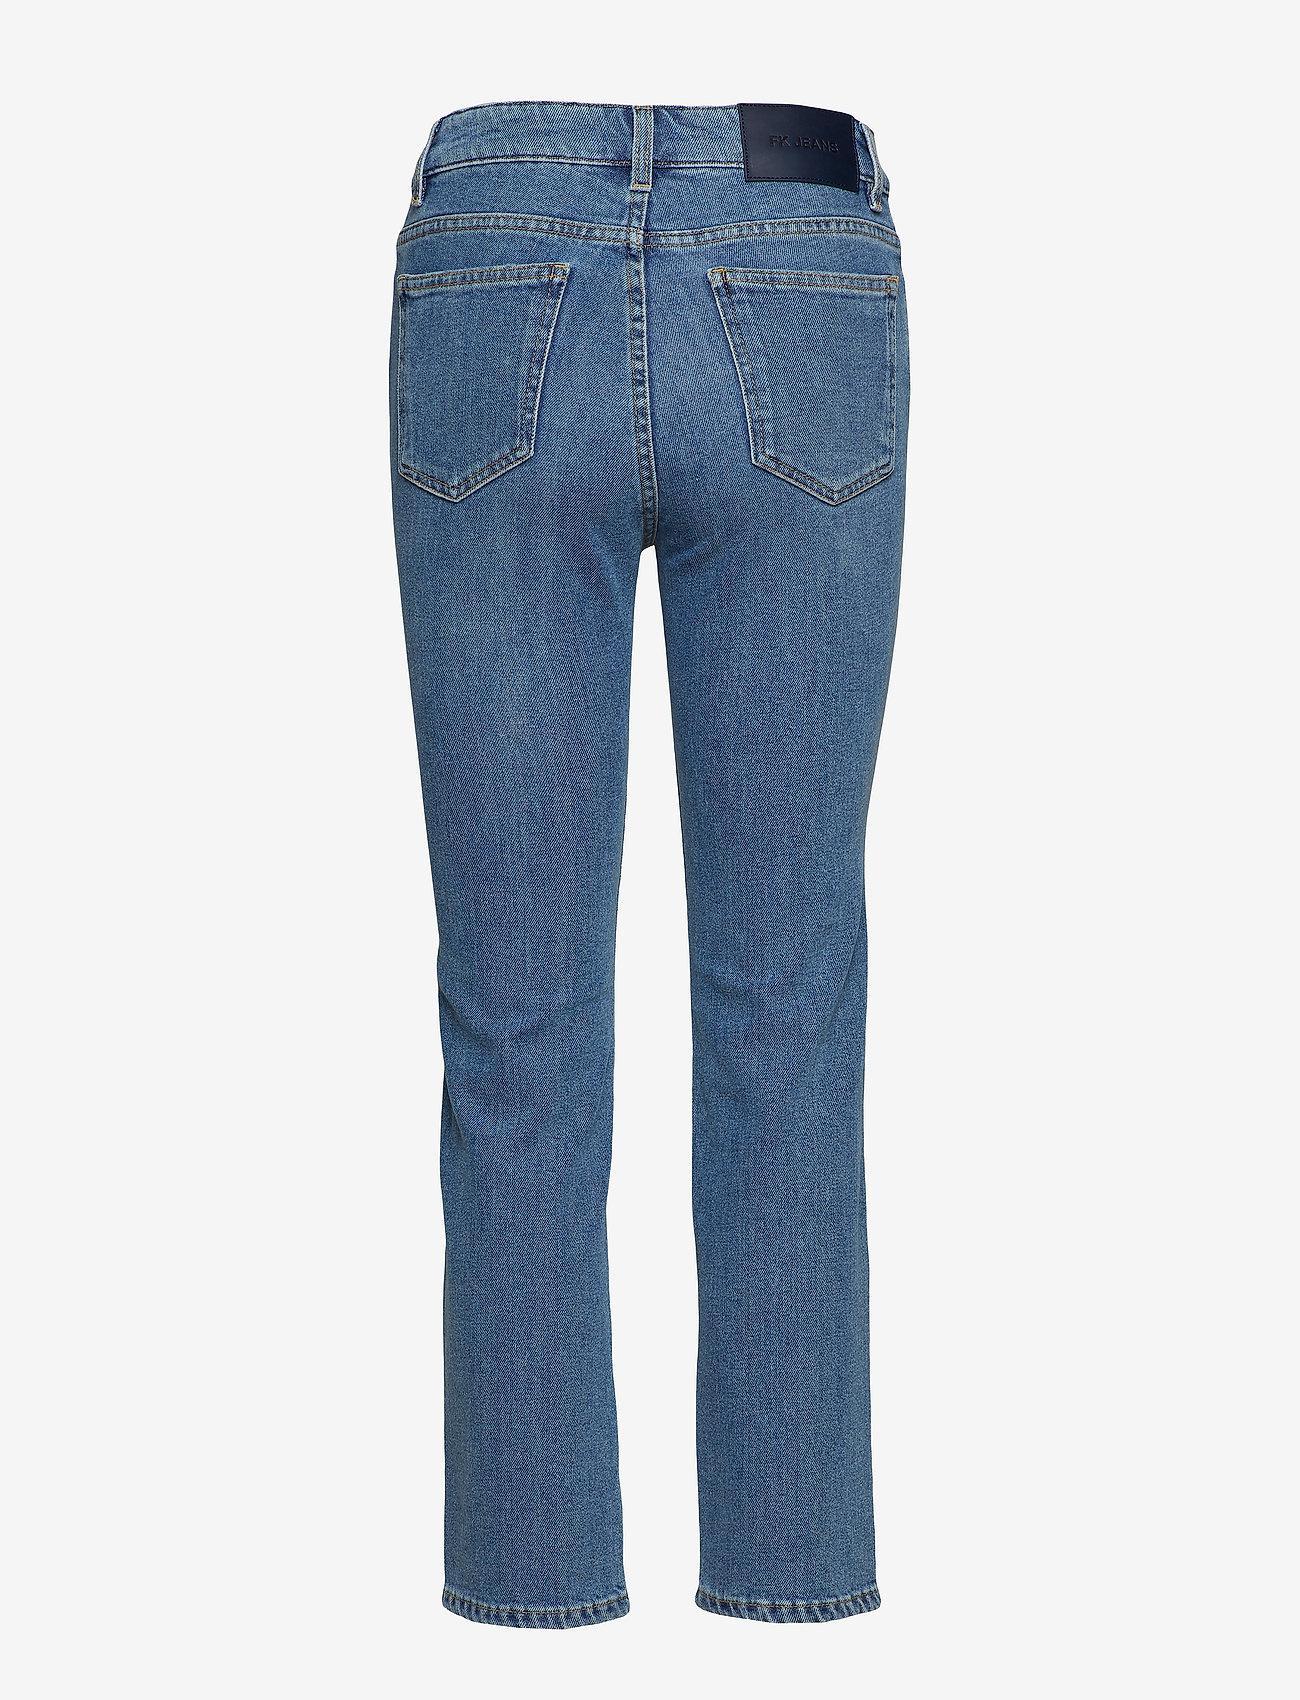 Stella Washed Jean (Mid Blue) (190 €) - Filippa K 0rnH3